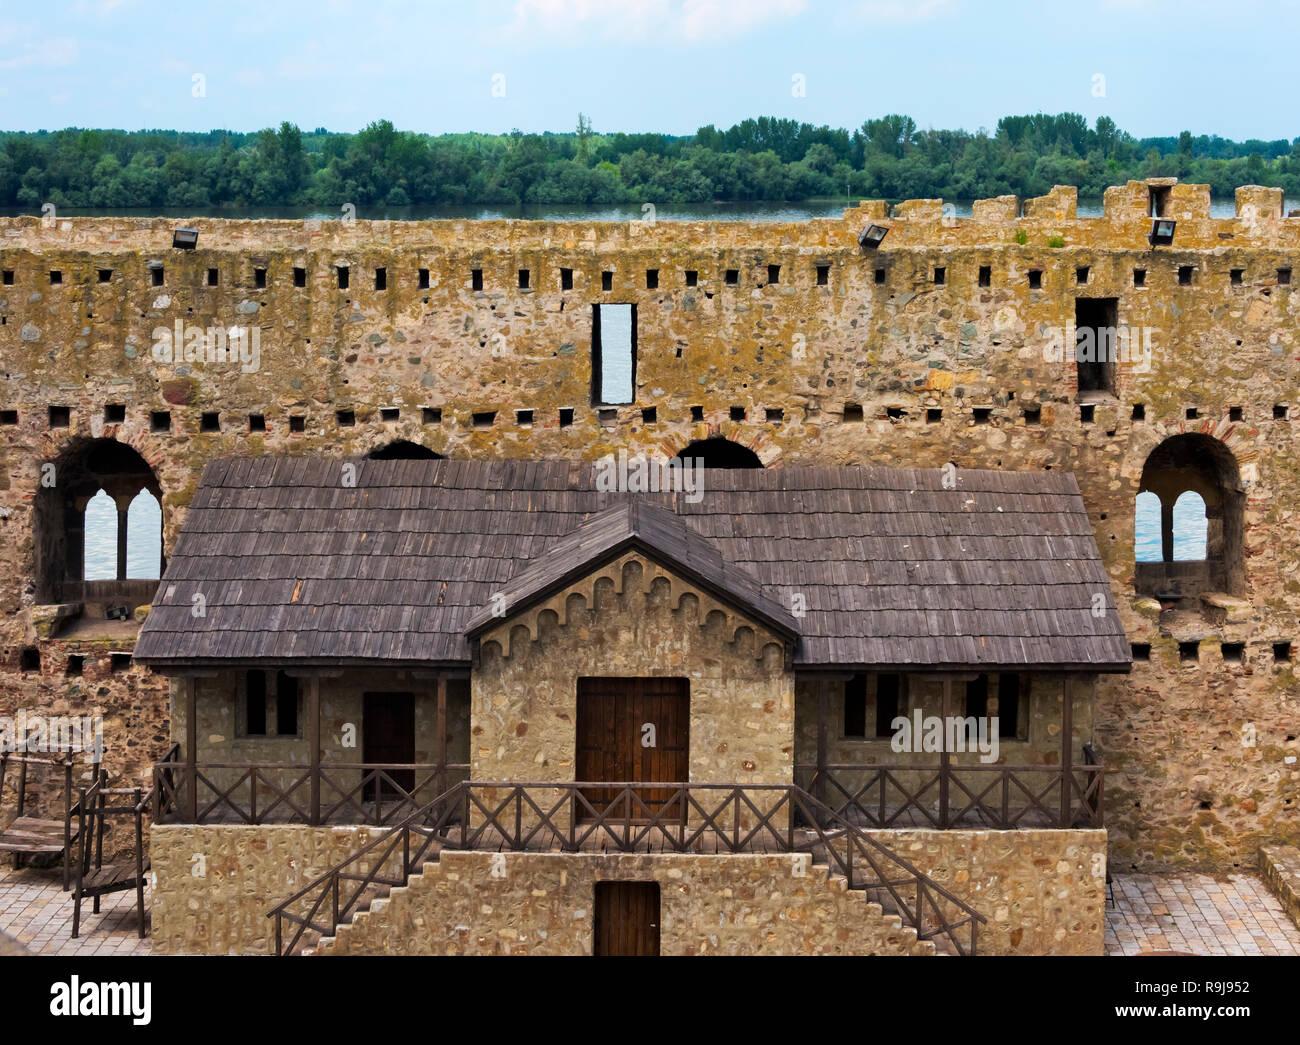 Smederevo Fortress, Serbia - Stock Image